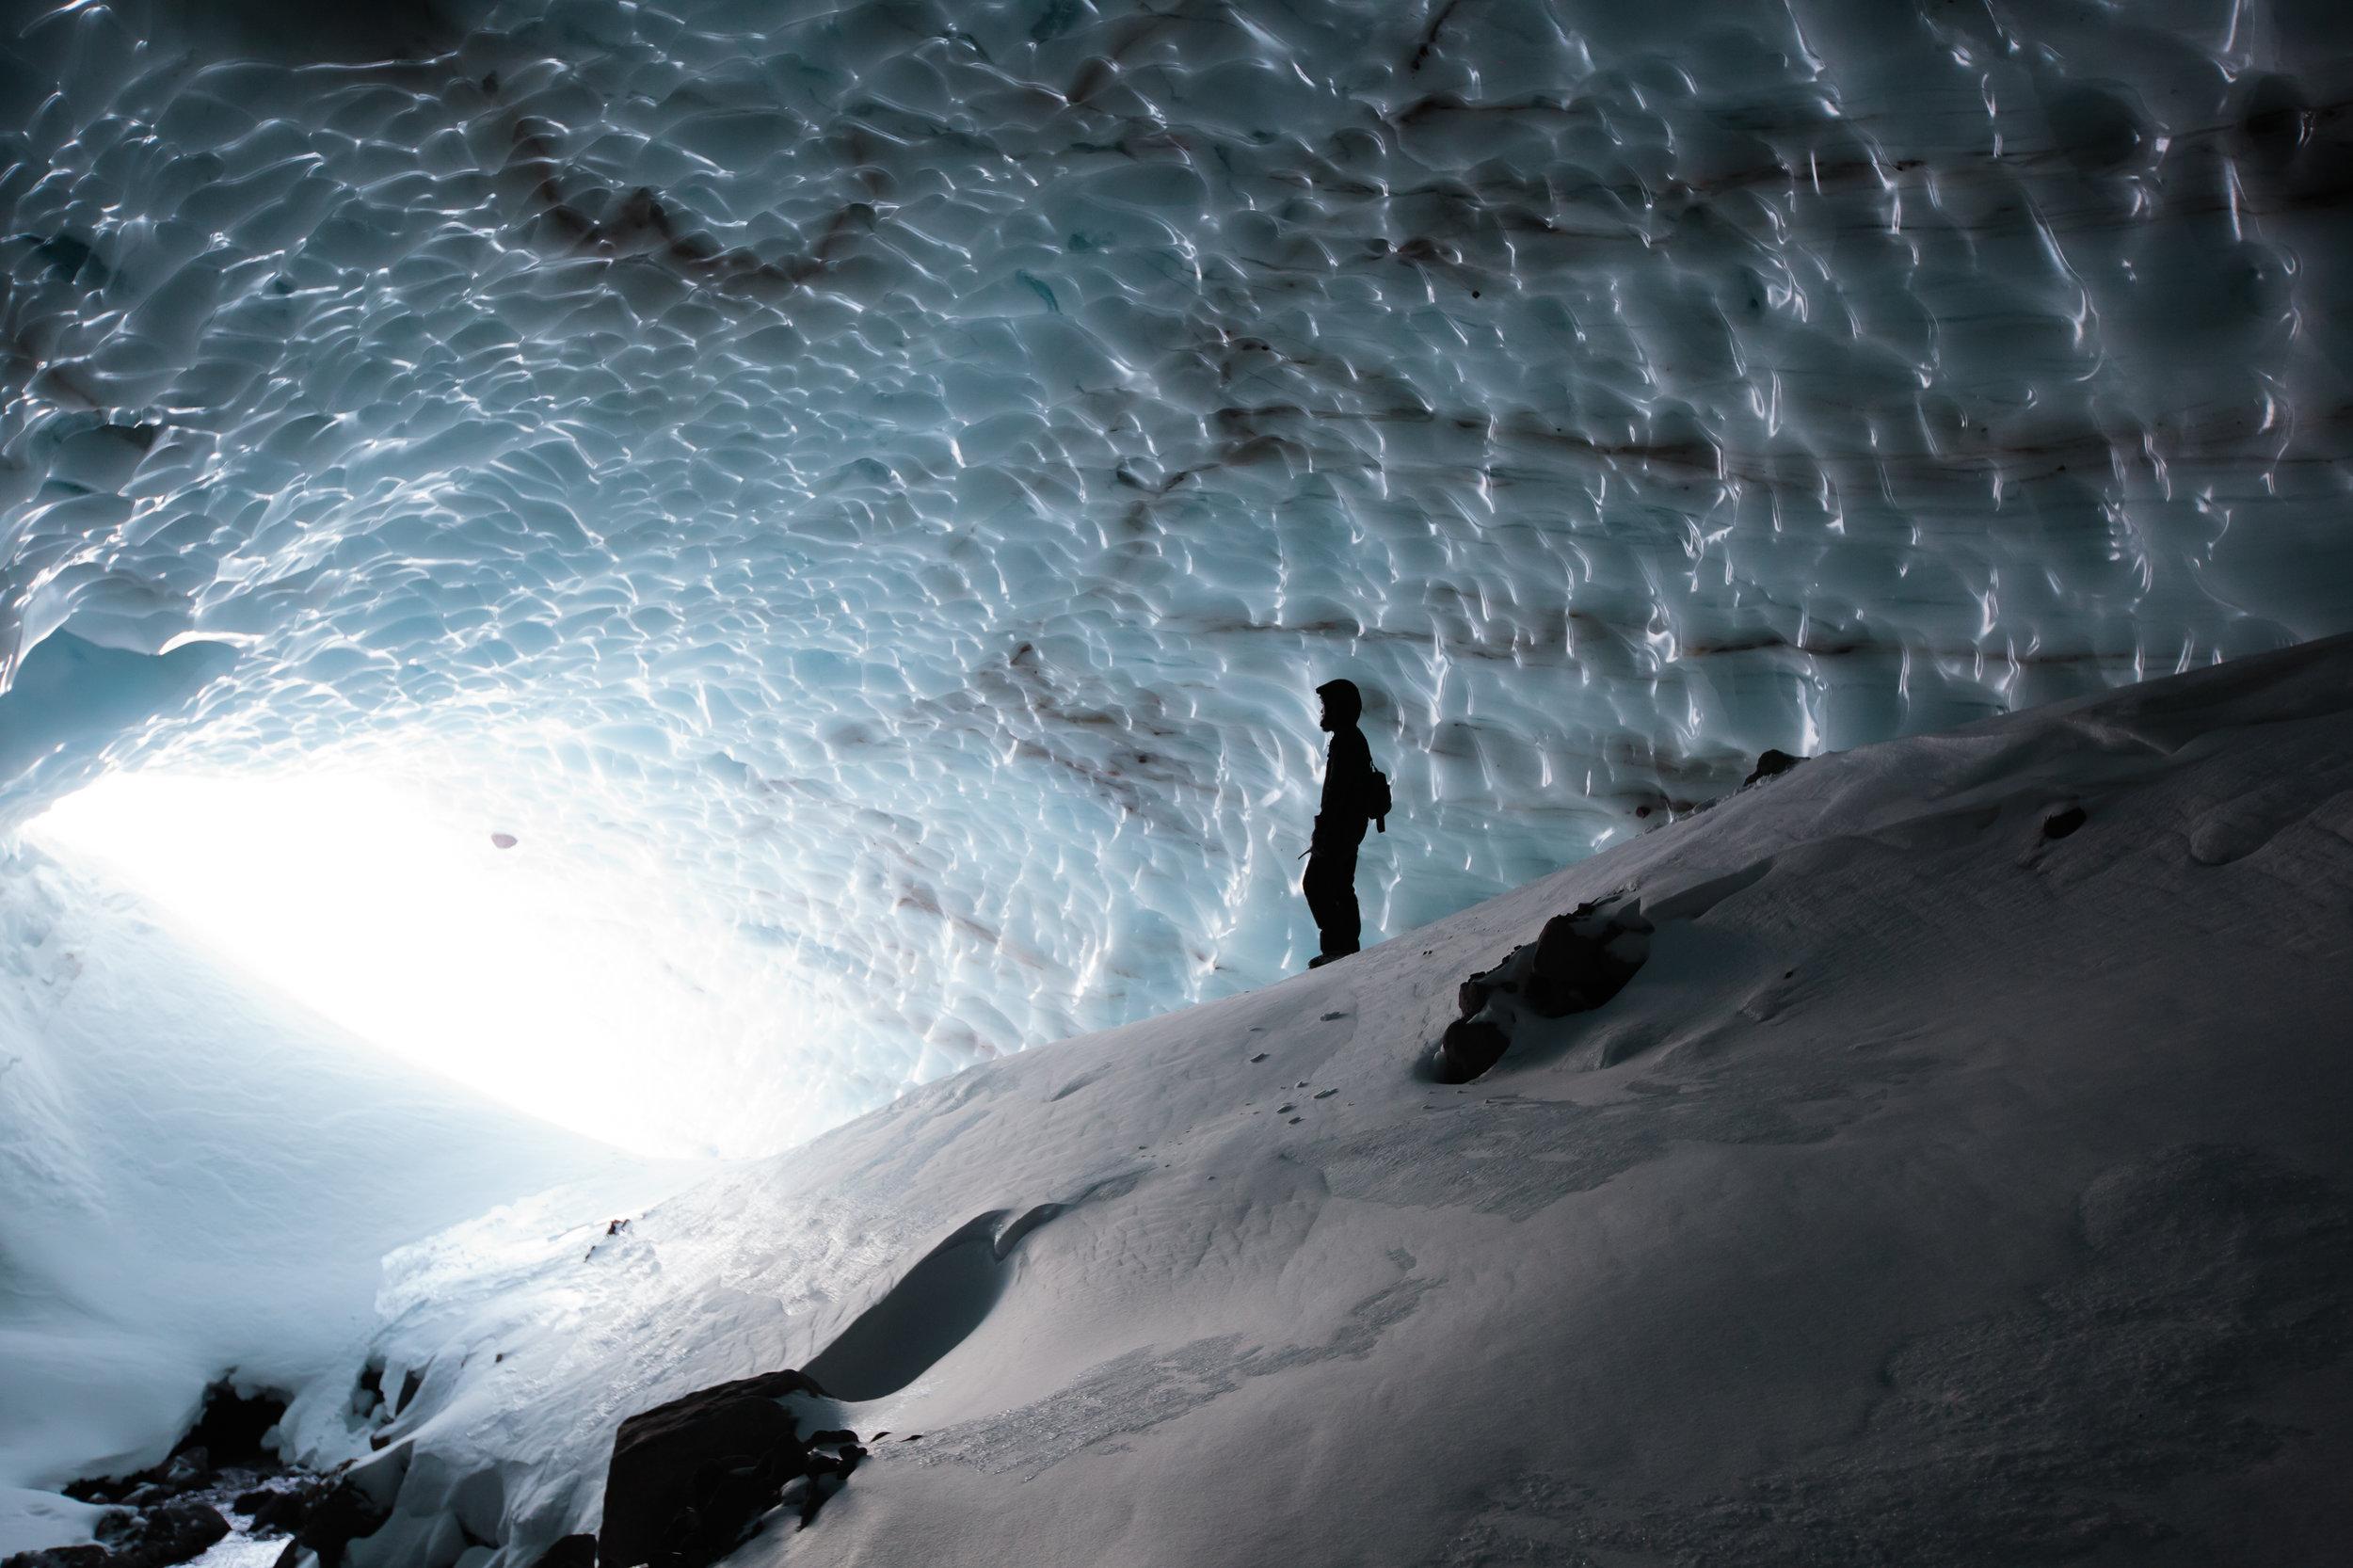 7_Hydeman_Mountain_Life_sunrsise_in_snowdragon-0087.jpg